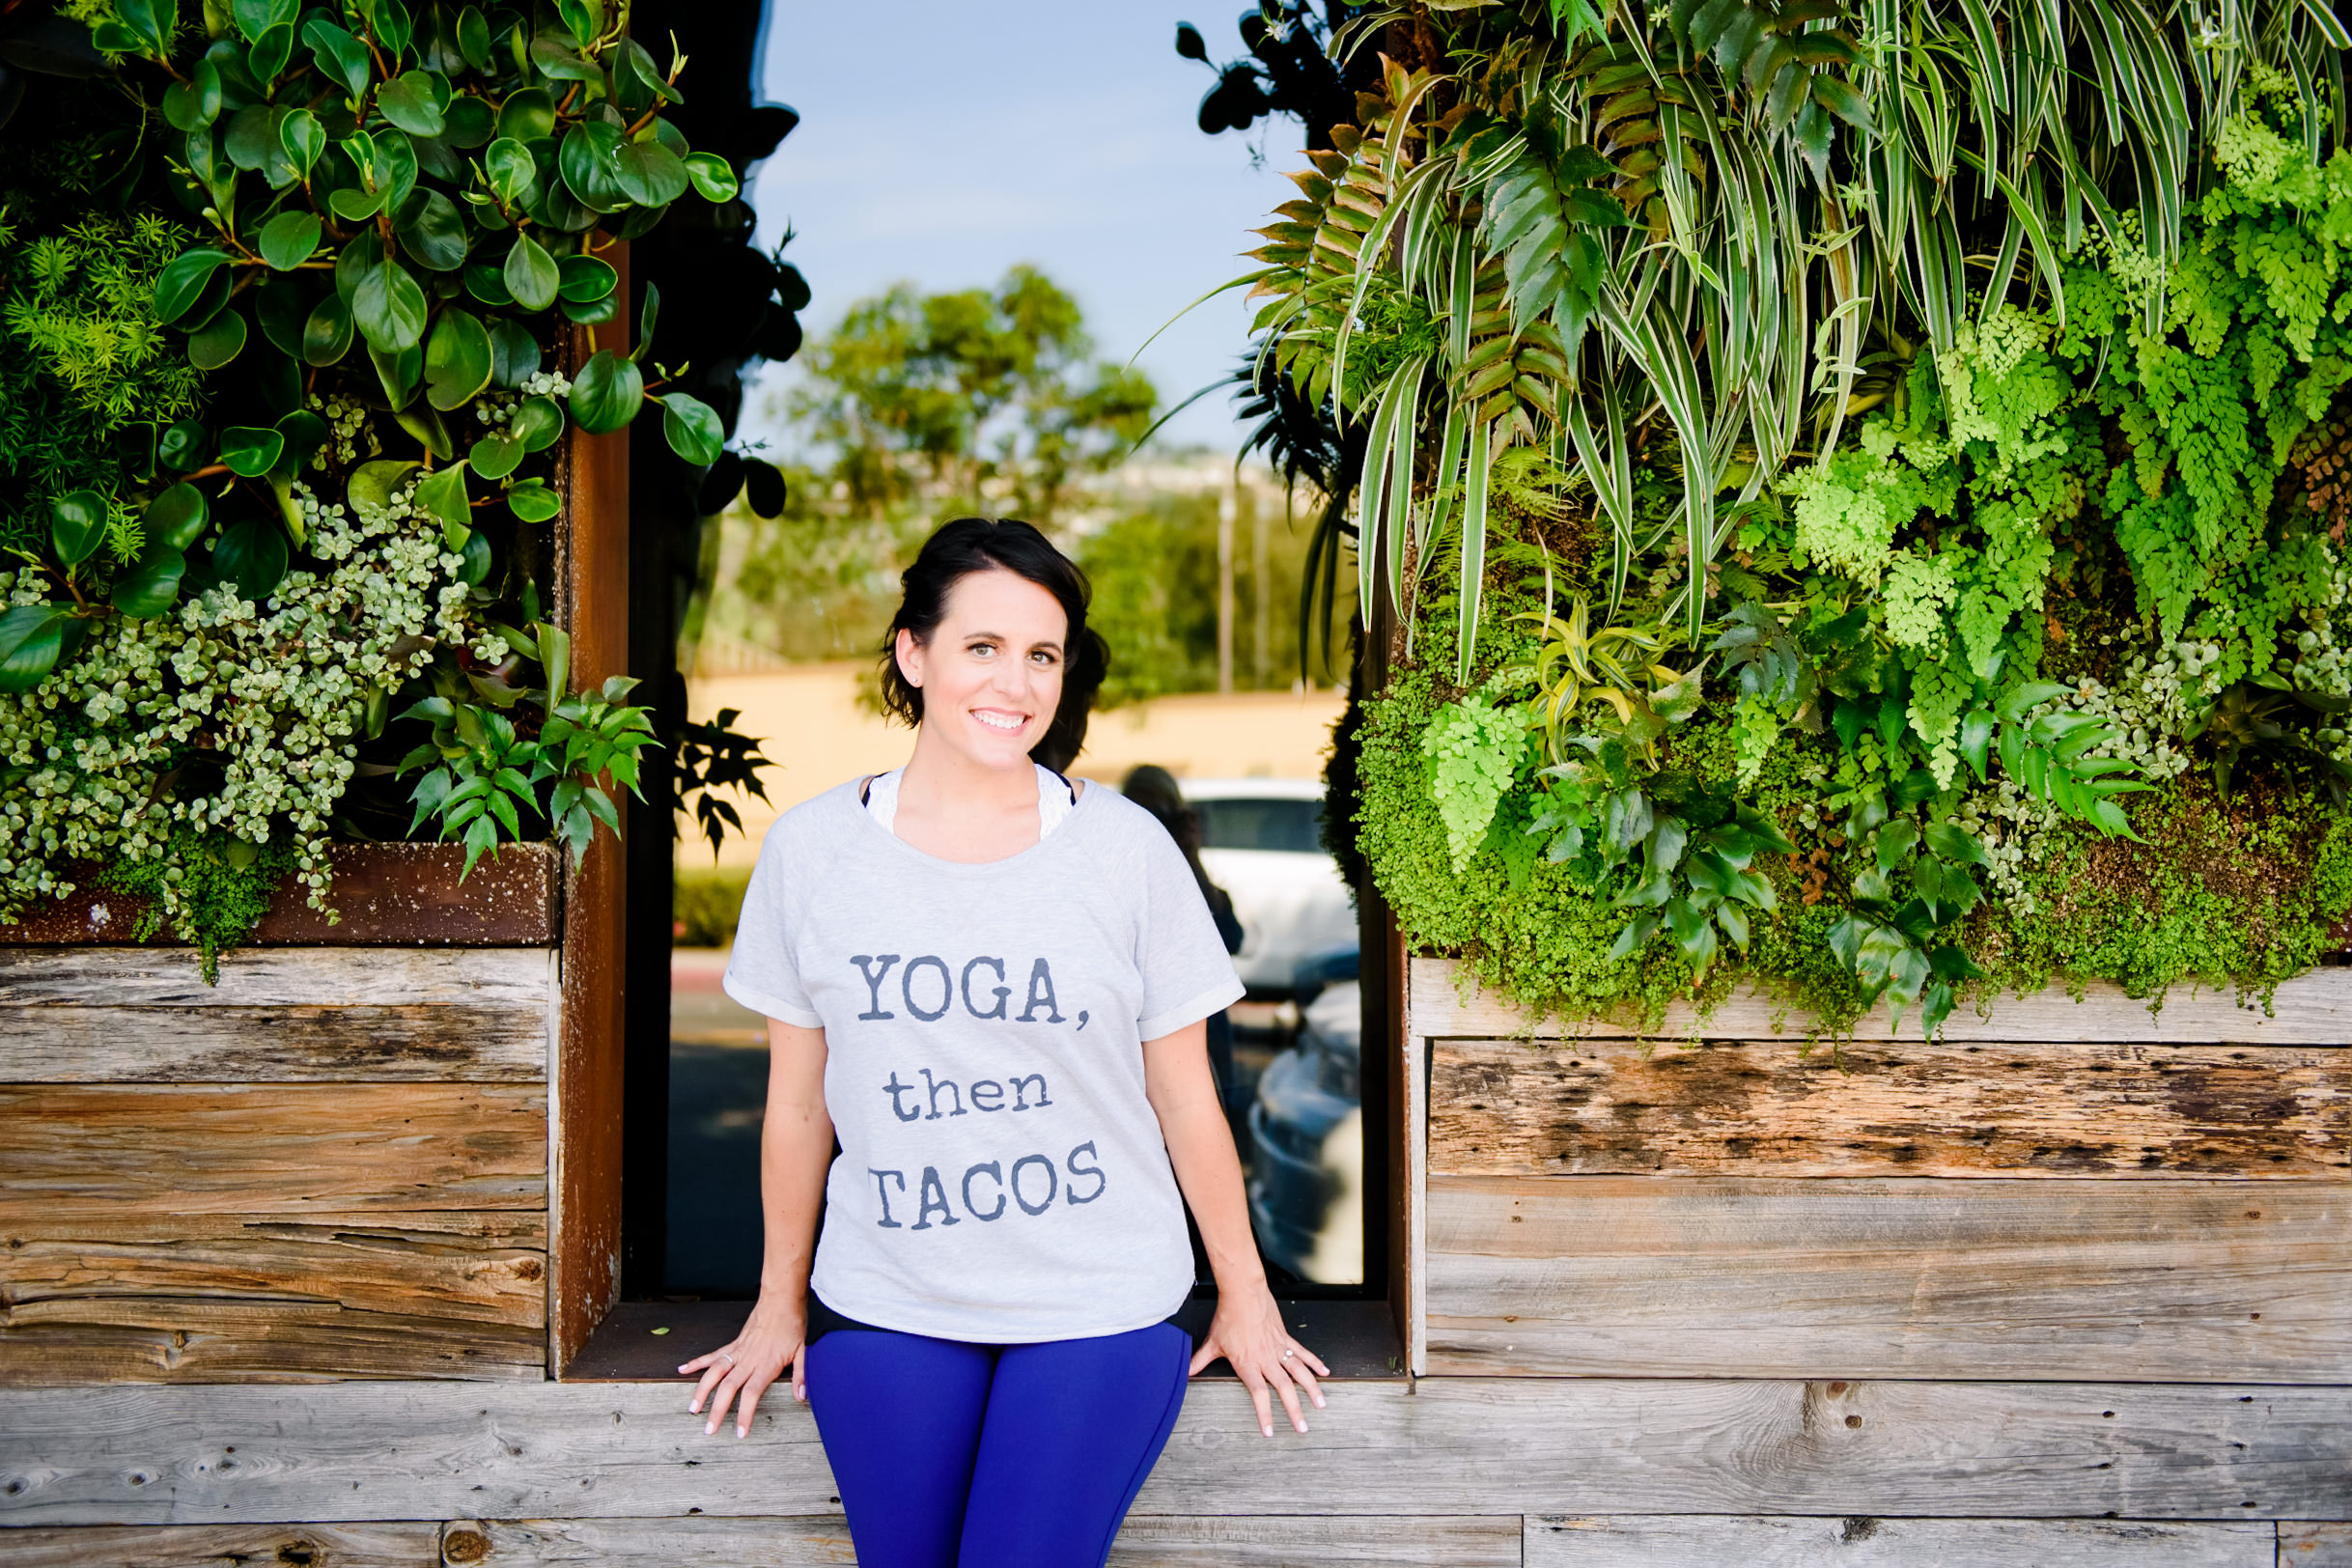 Robyn D'Angelo, LMFT - Founder + Relationship Therapist